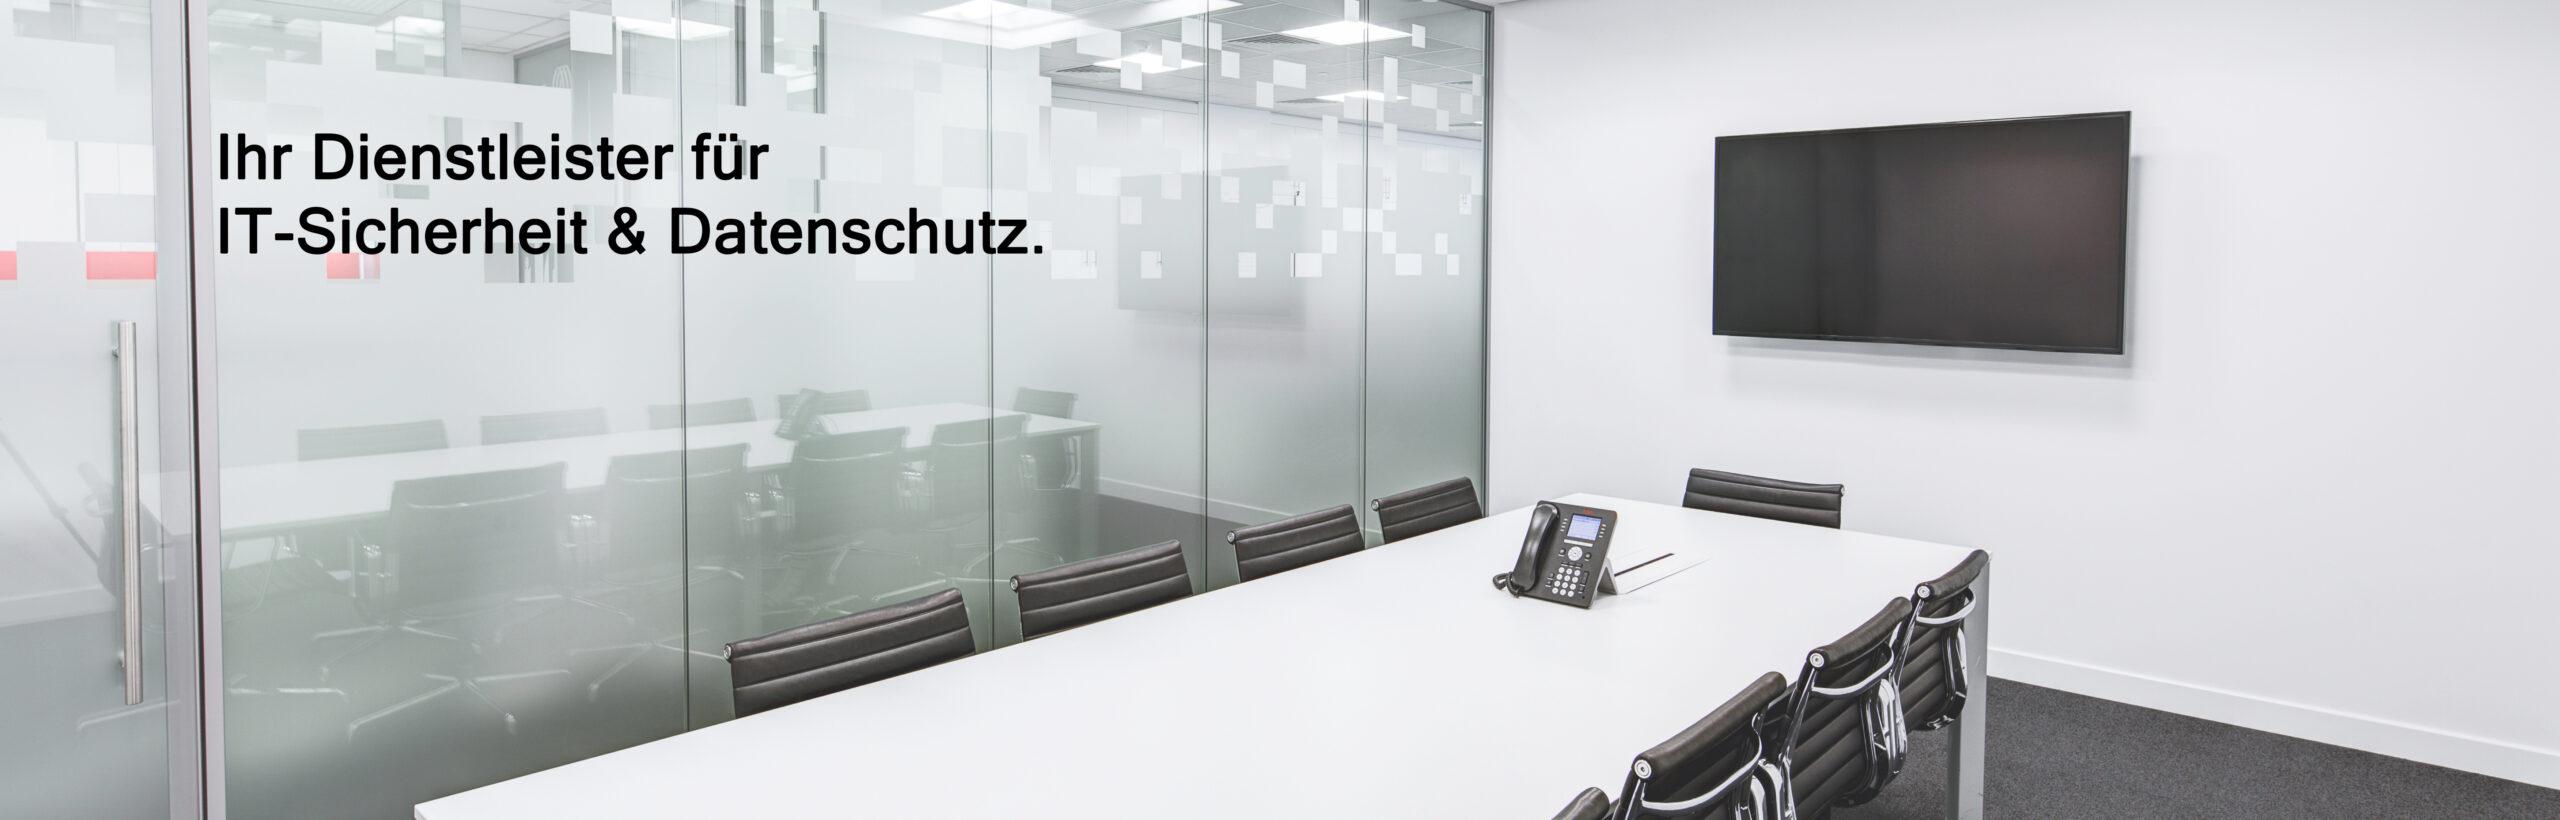 salutem-one GmbH